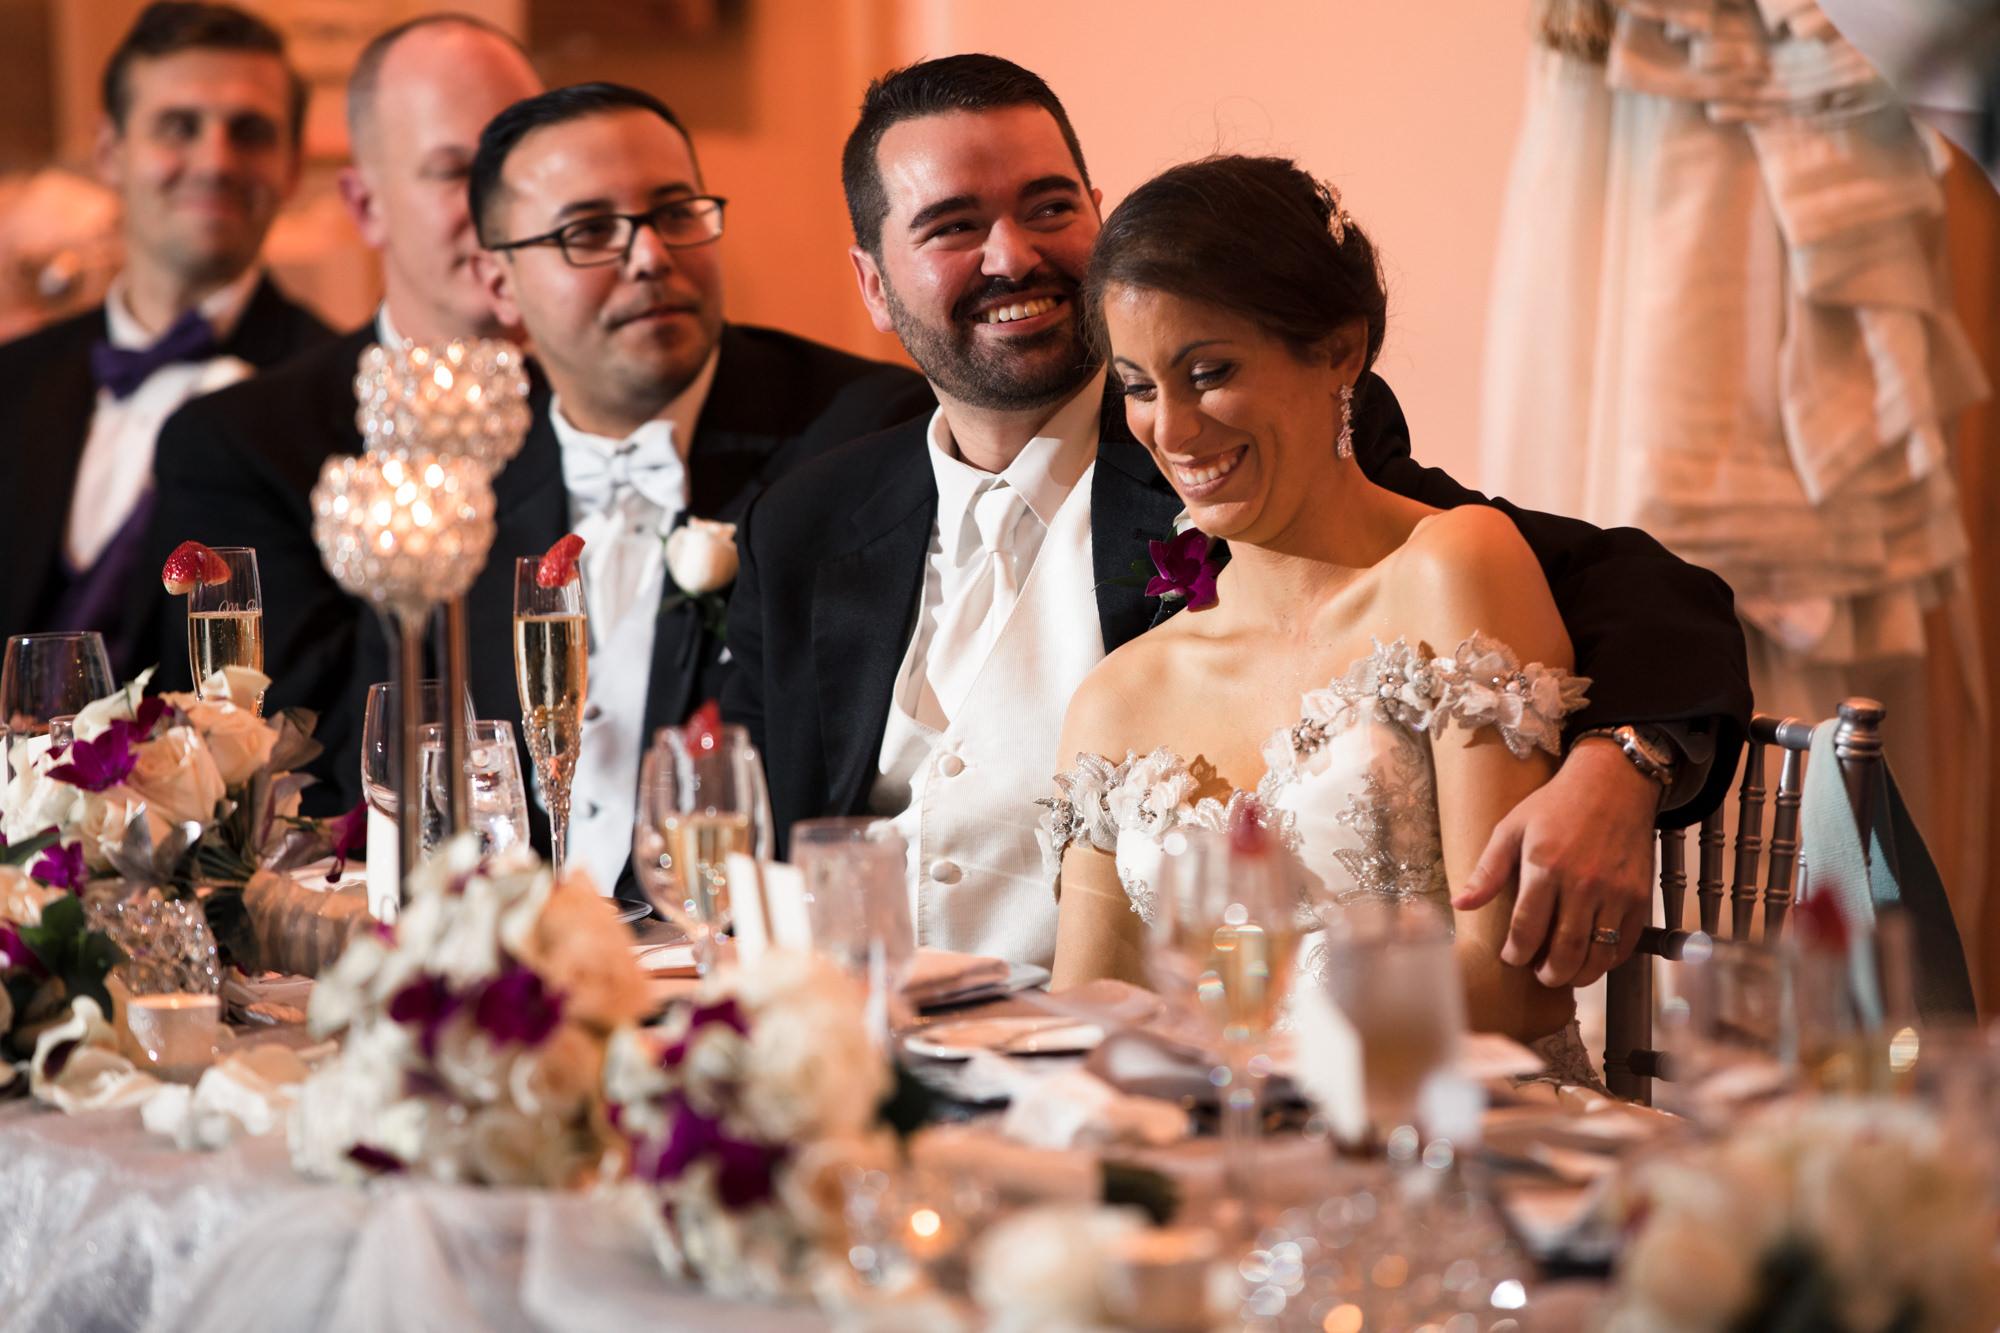 Benvenuto_Wedding_catholic_Florida_Bride-Groom-116.jpg